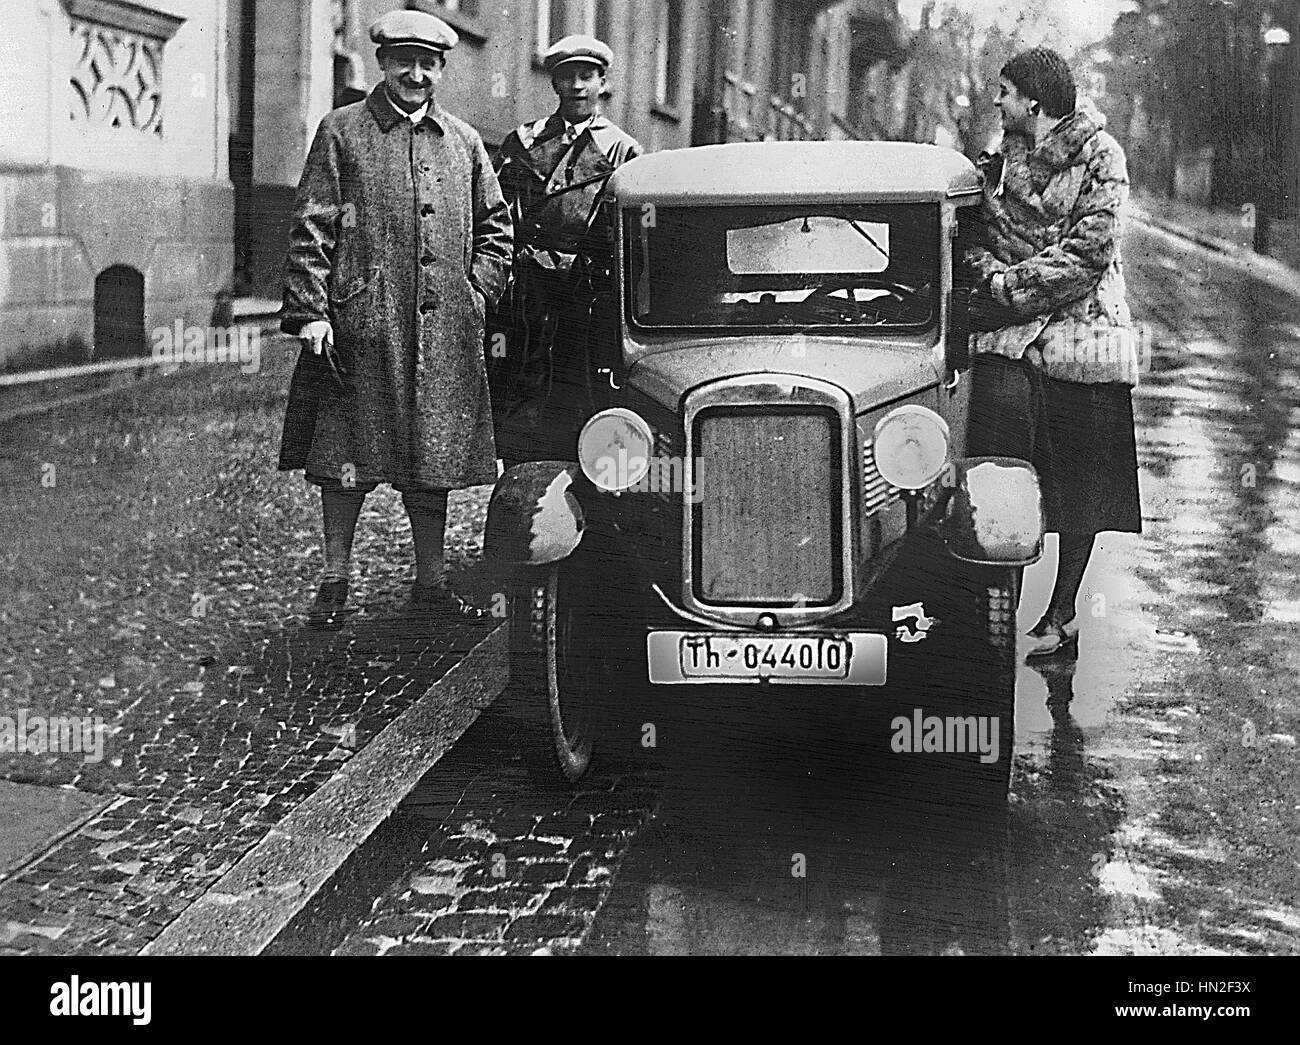 BMW Dixi 1930 3-15 Photo Stock